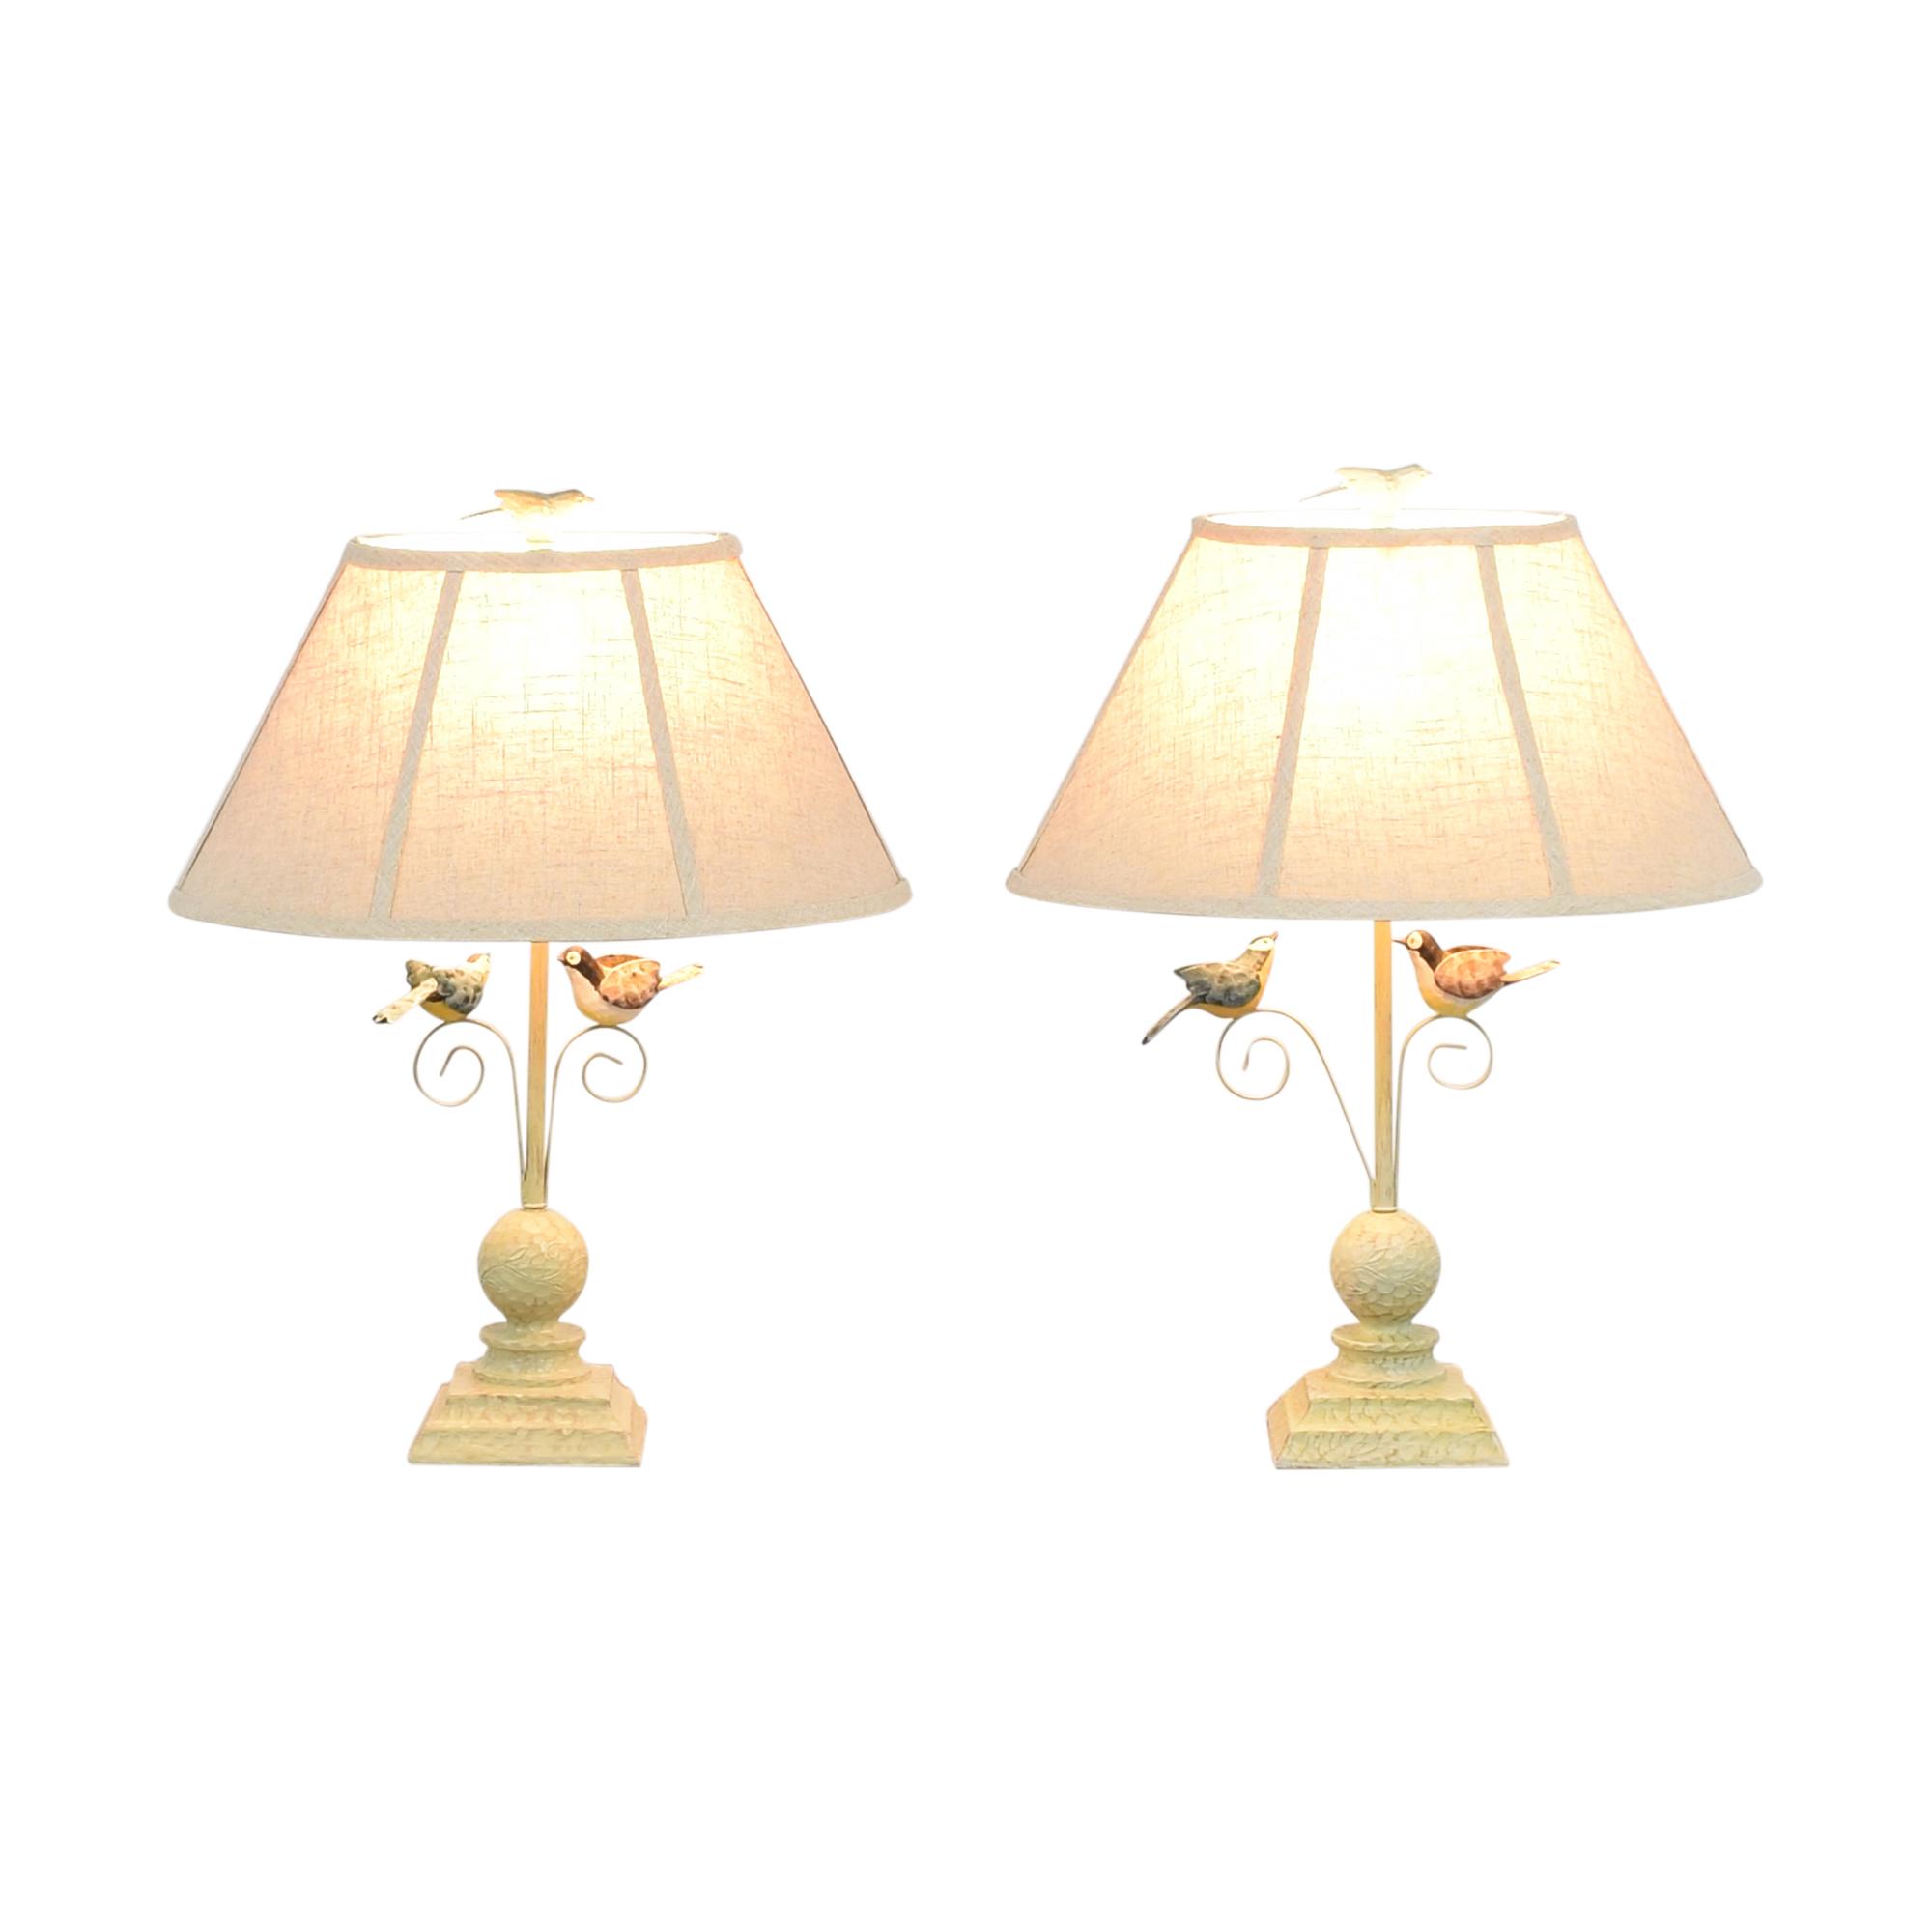 AHS Lighting AHS Lighting Fly Away Together Table Lamps on sale